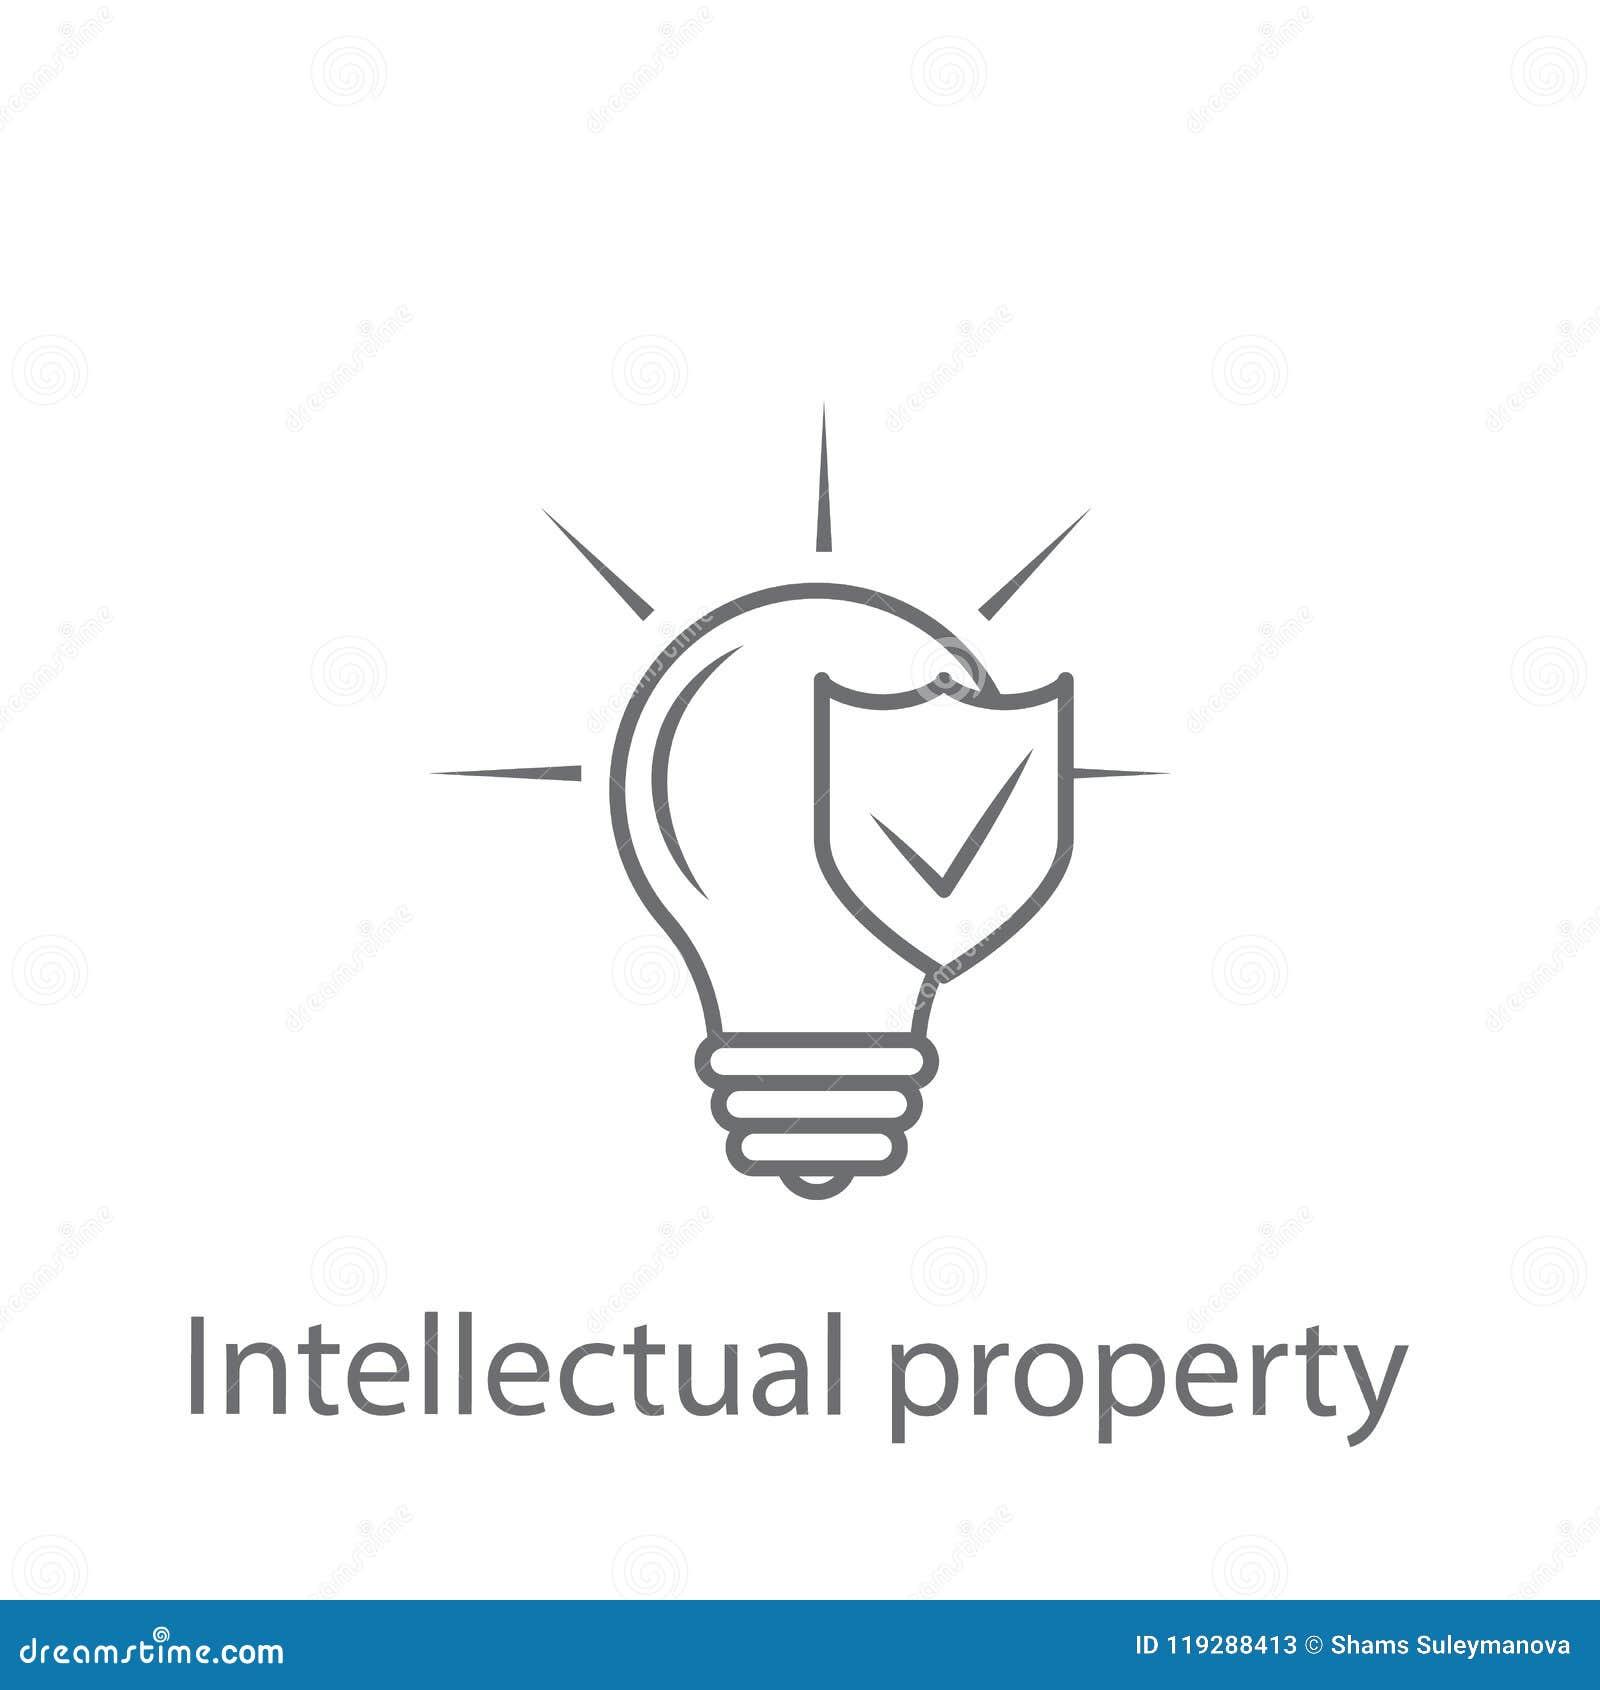 the concept of intellectual property protection  cartoon vector